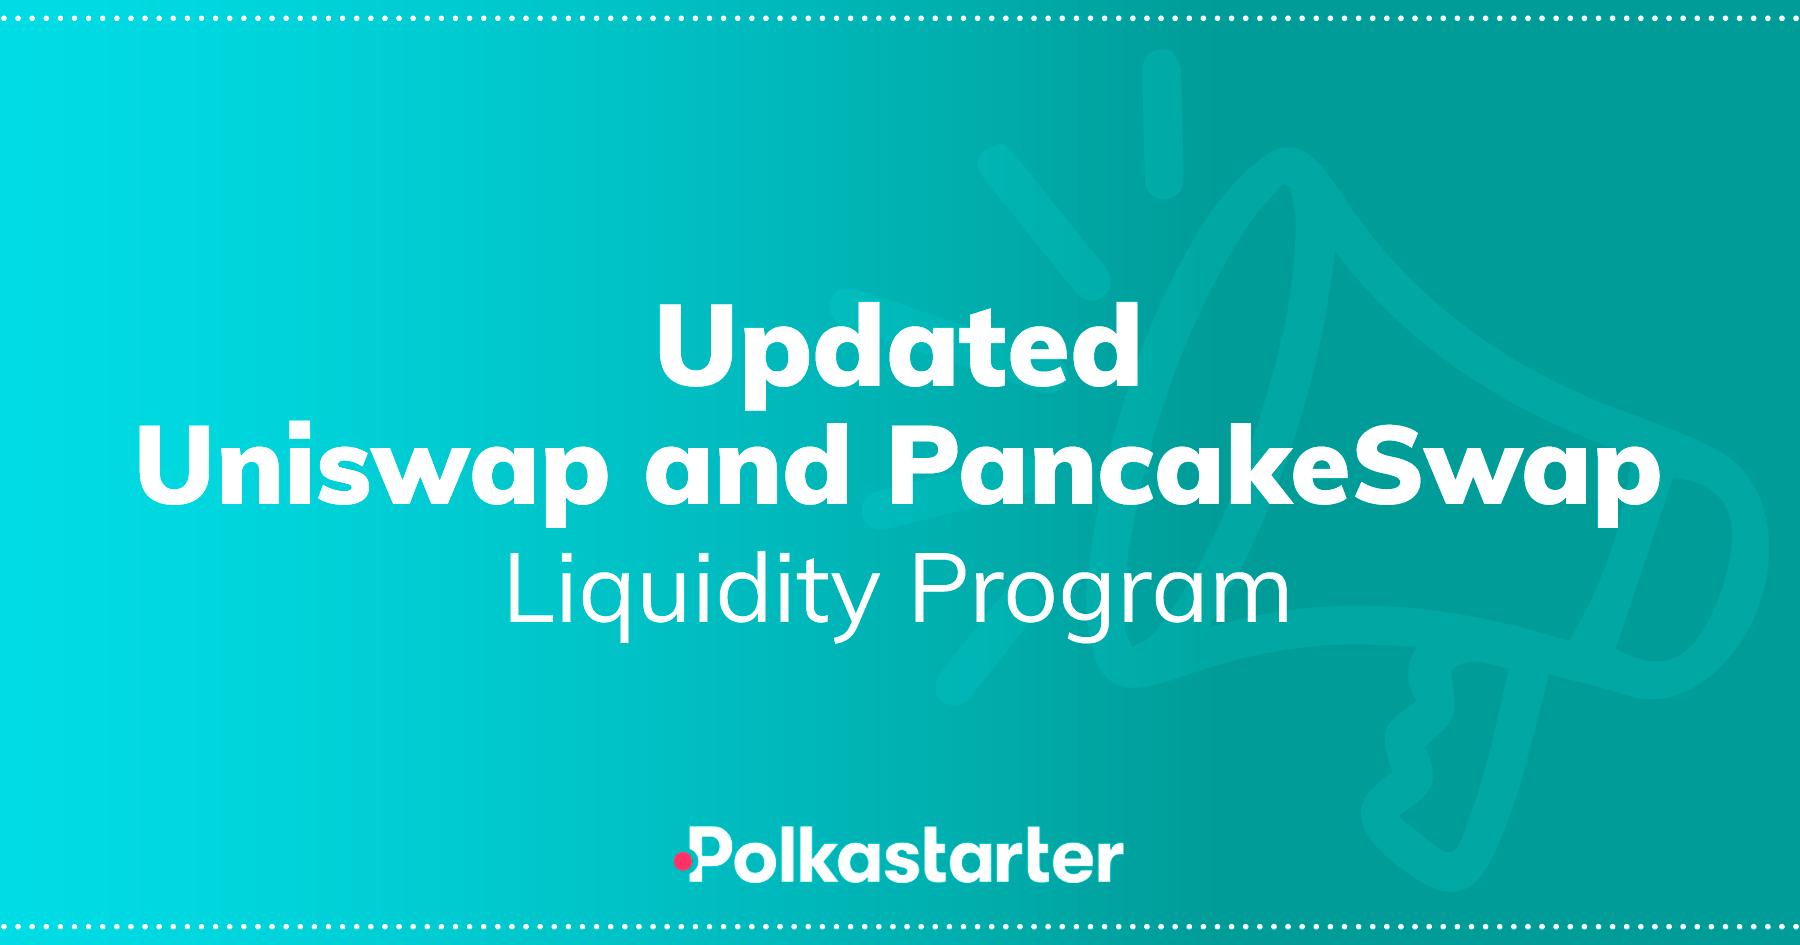 [PolkaStarter] Our Updated Uniswap and Pancake Swap Liquidity Program - AZCoin News